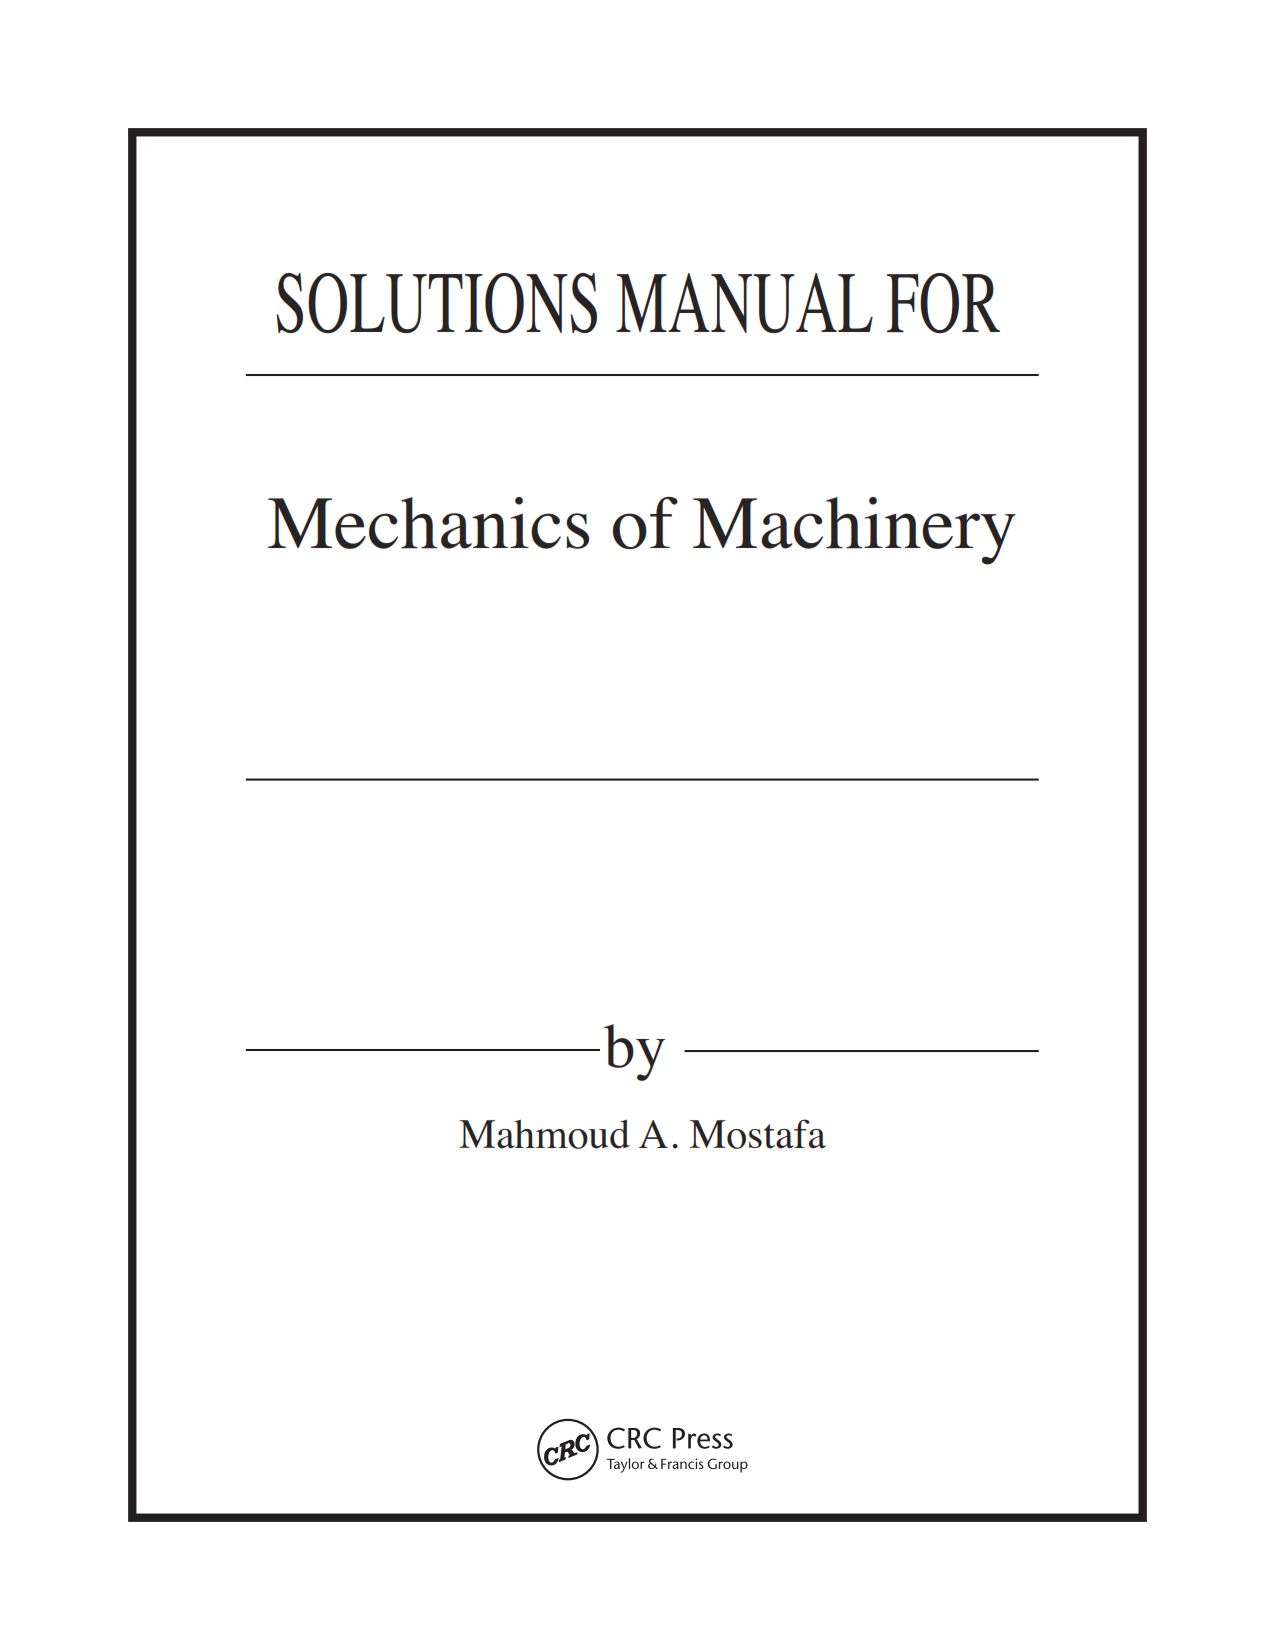 دانلود حل المسائل کتاب مکانیک ماشین آلات محمود مصطفی pdf رایگان 2017 Solution Manual of Mechanics of Machinery - Mahmoud A. Mostafa